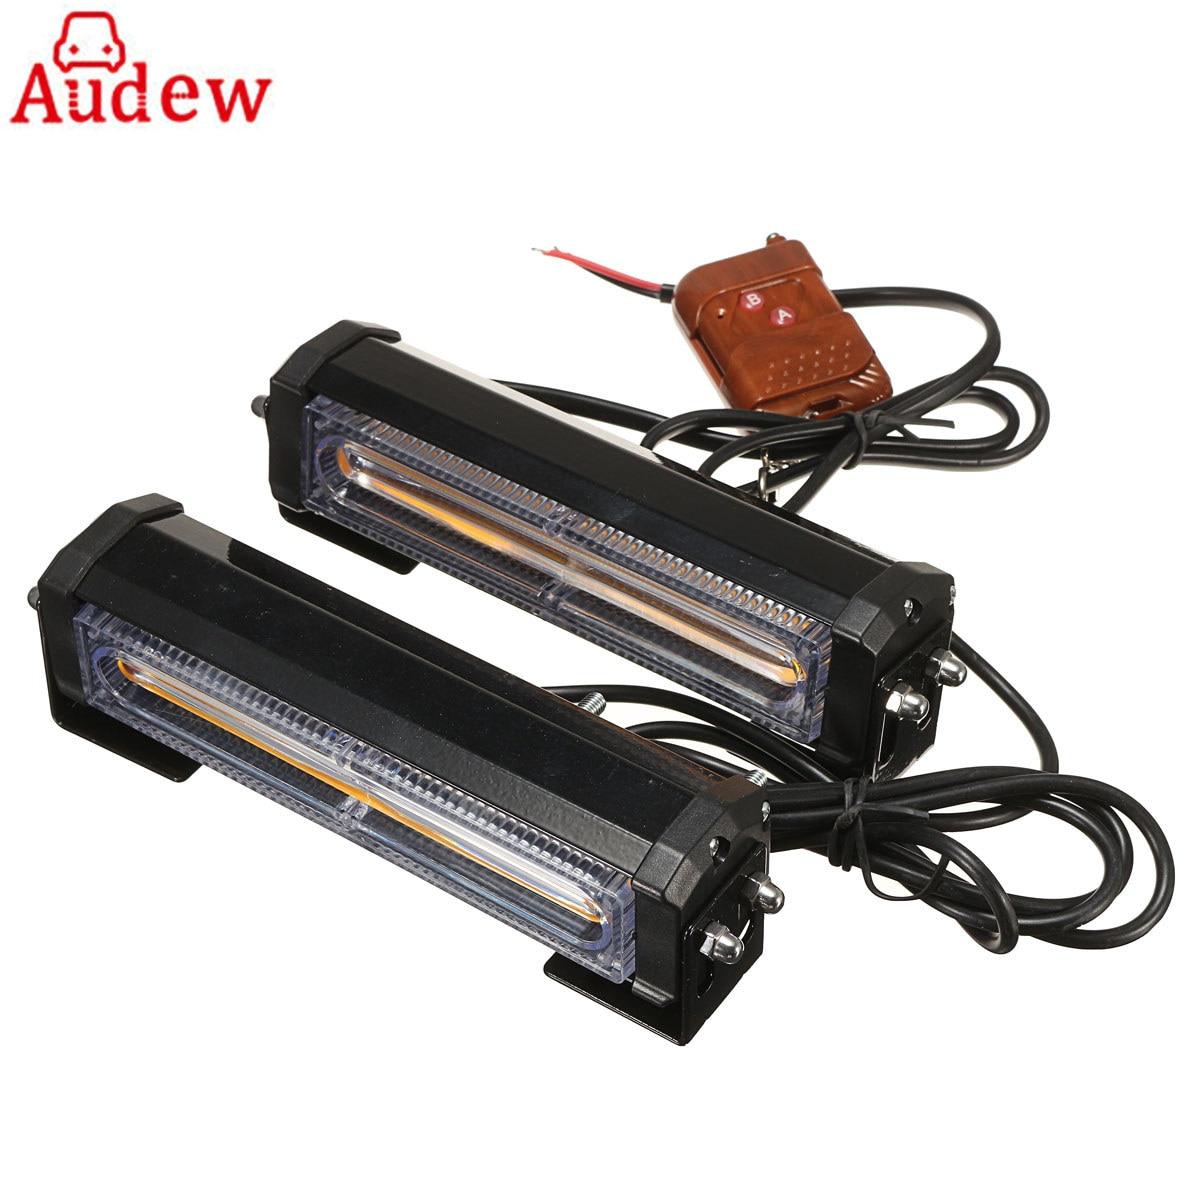 2Pcs Amber COB Car Vehicle LED Emergency Warning Lamp Security Flashing Strobe Light Bars w/ Remote Control 12V